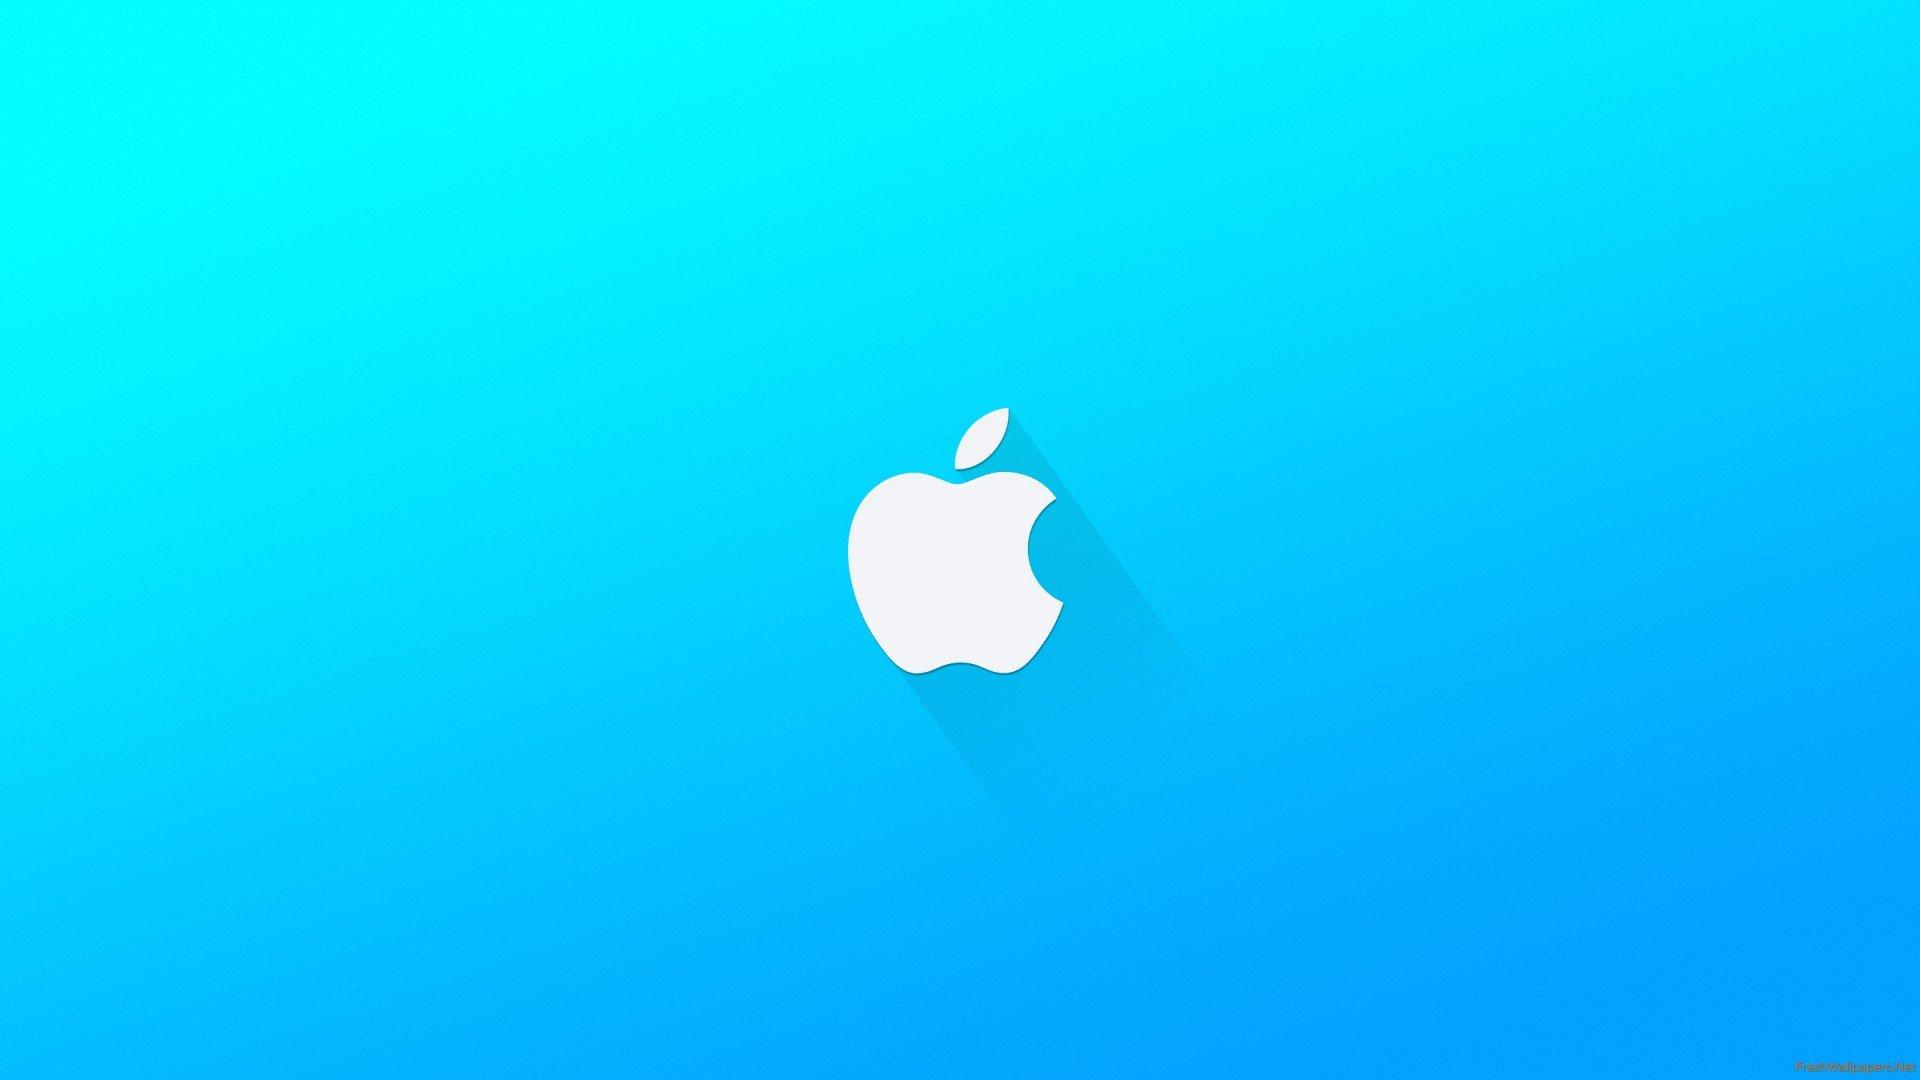 apple-logo-6